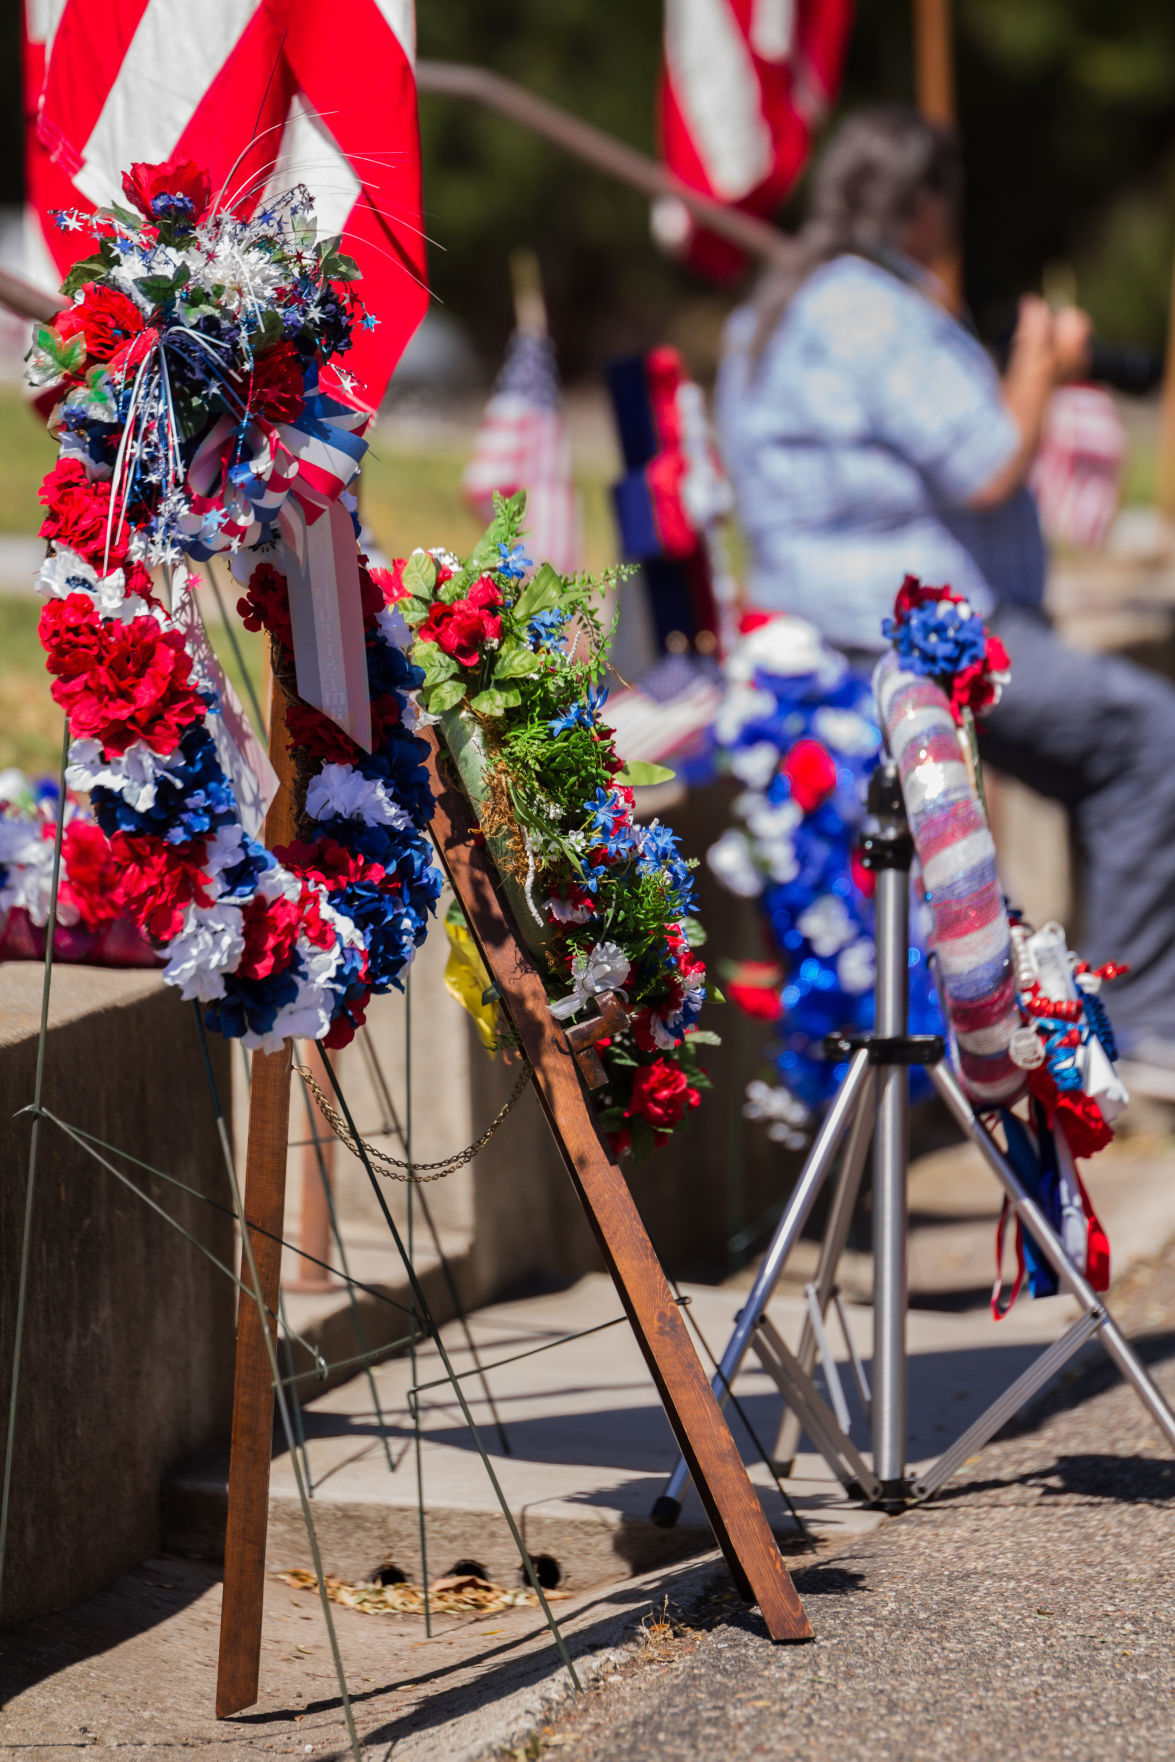 052818 Lompoc Memorial Day 07.jpg